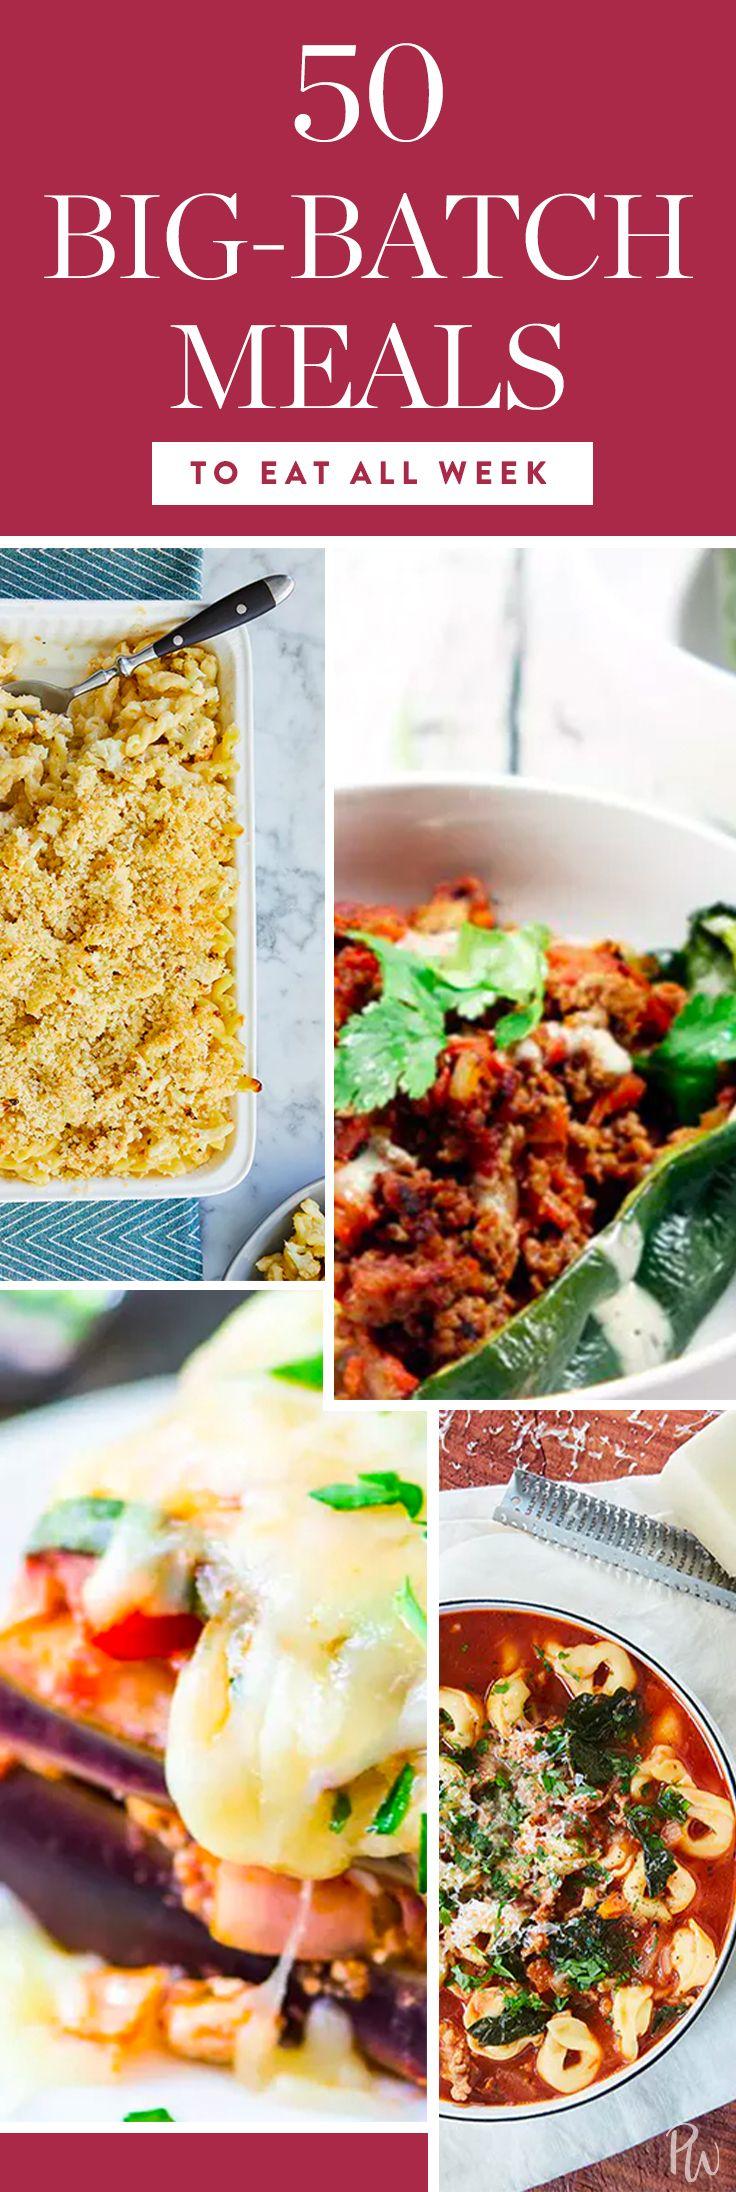 50 Big-Batch Meals to Make Once and Eat All Week via @PureWow via @PureWow